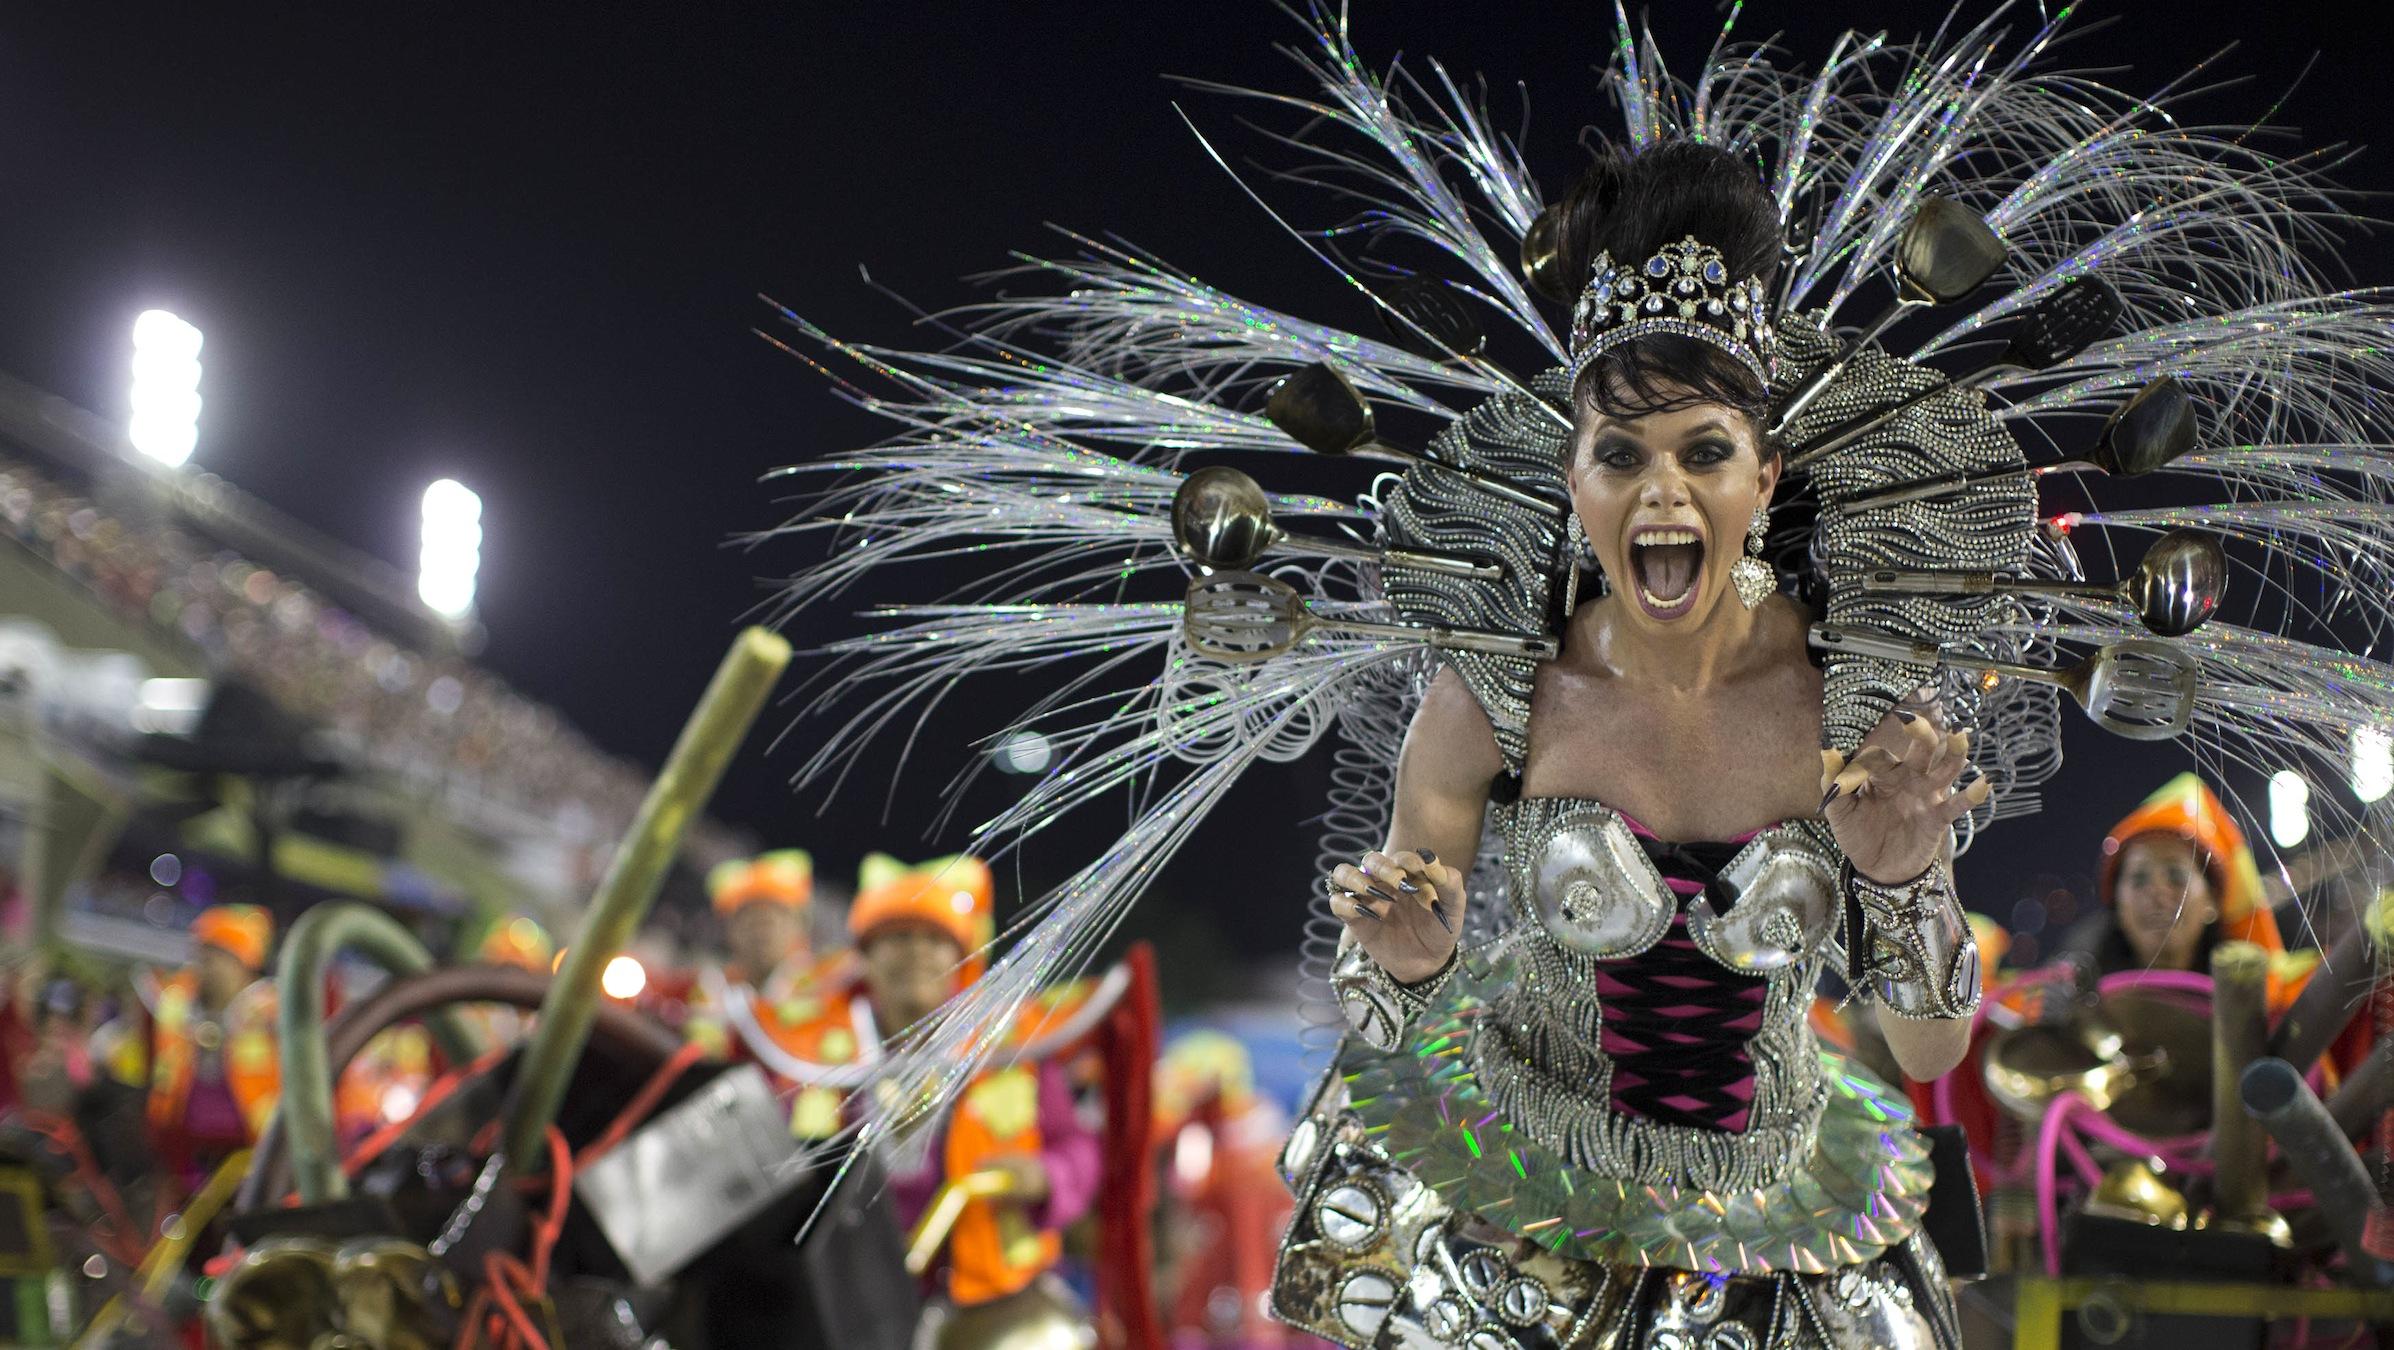 A performer from the Sao Clemente samba school parades during carnival celebrations at the Sambadrome in Rio de Janeiro, Brazil, Monday, Feb. 11, 2013. (AP Photo/Felipe Dana)